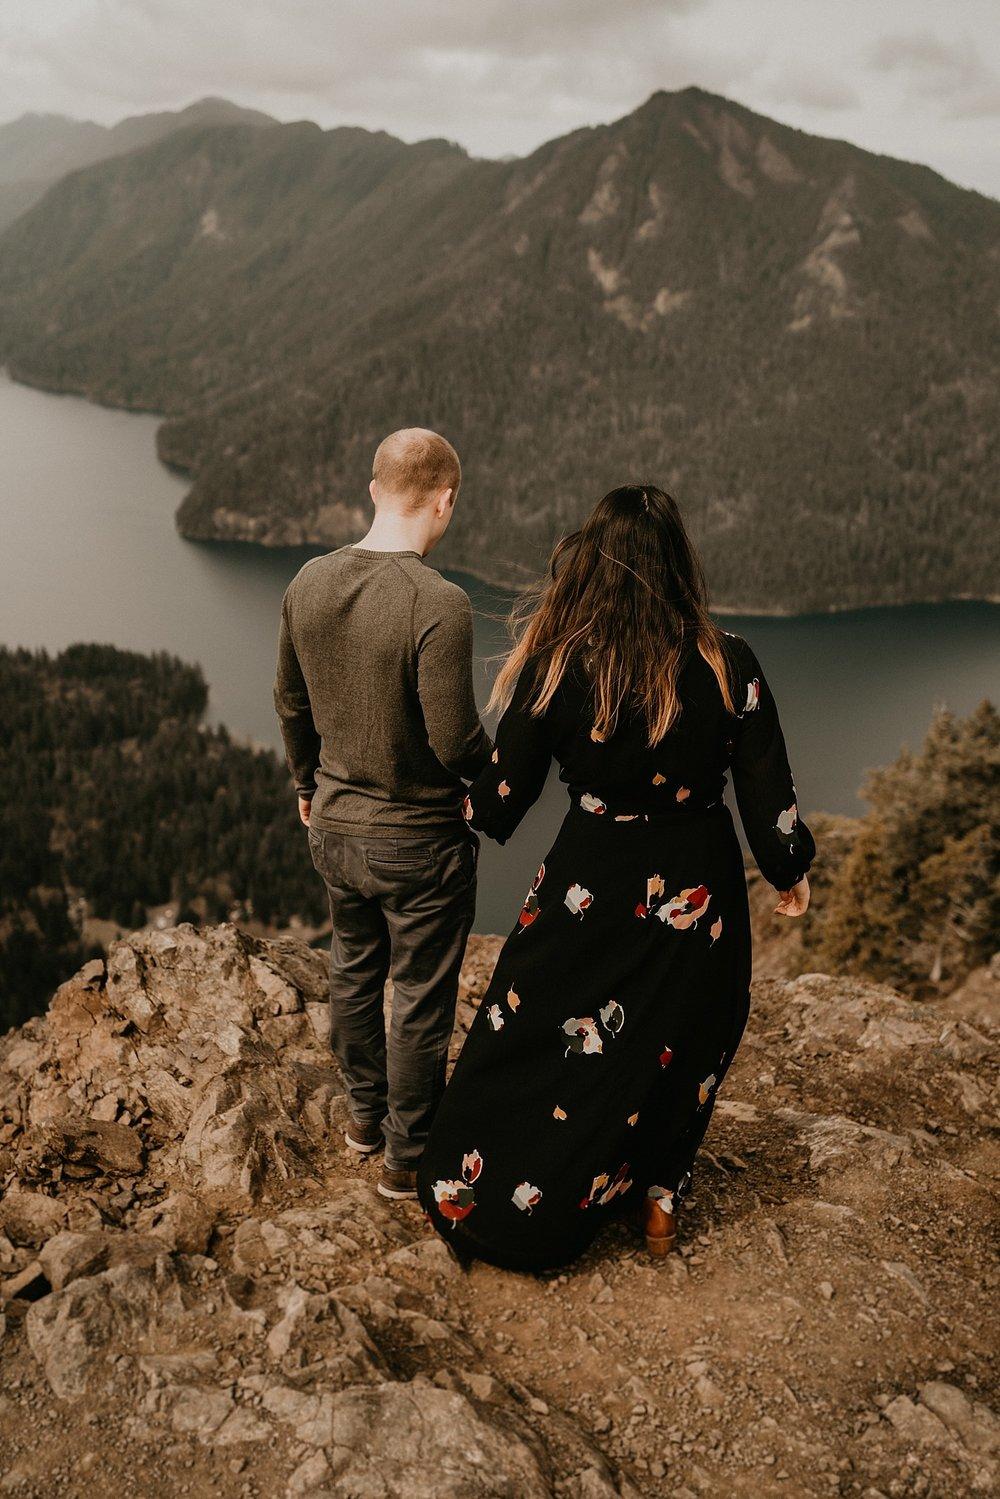 Lake-Crescent-Mount-Storm-King-Hiking-Adventure-Engagement-Seattle-Wedding-Photographer_0020.jpg